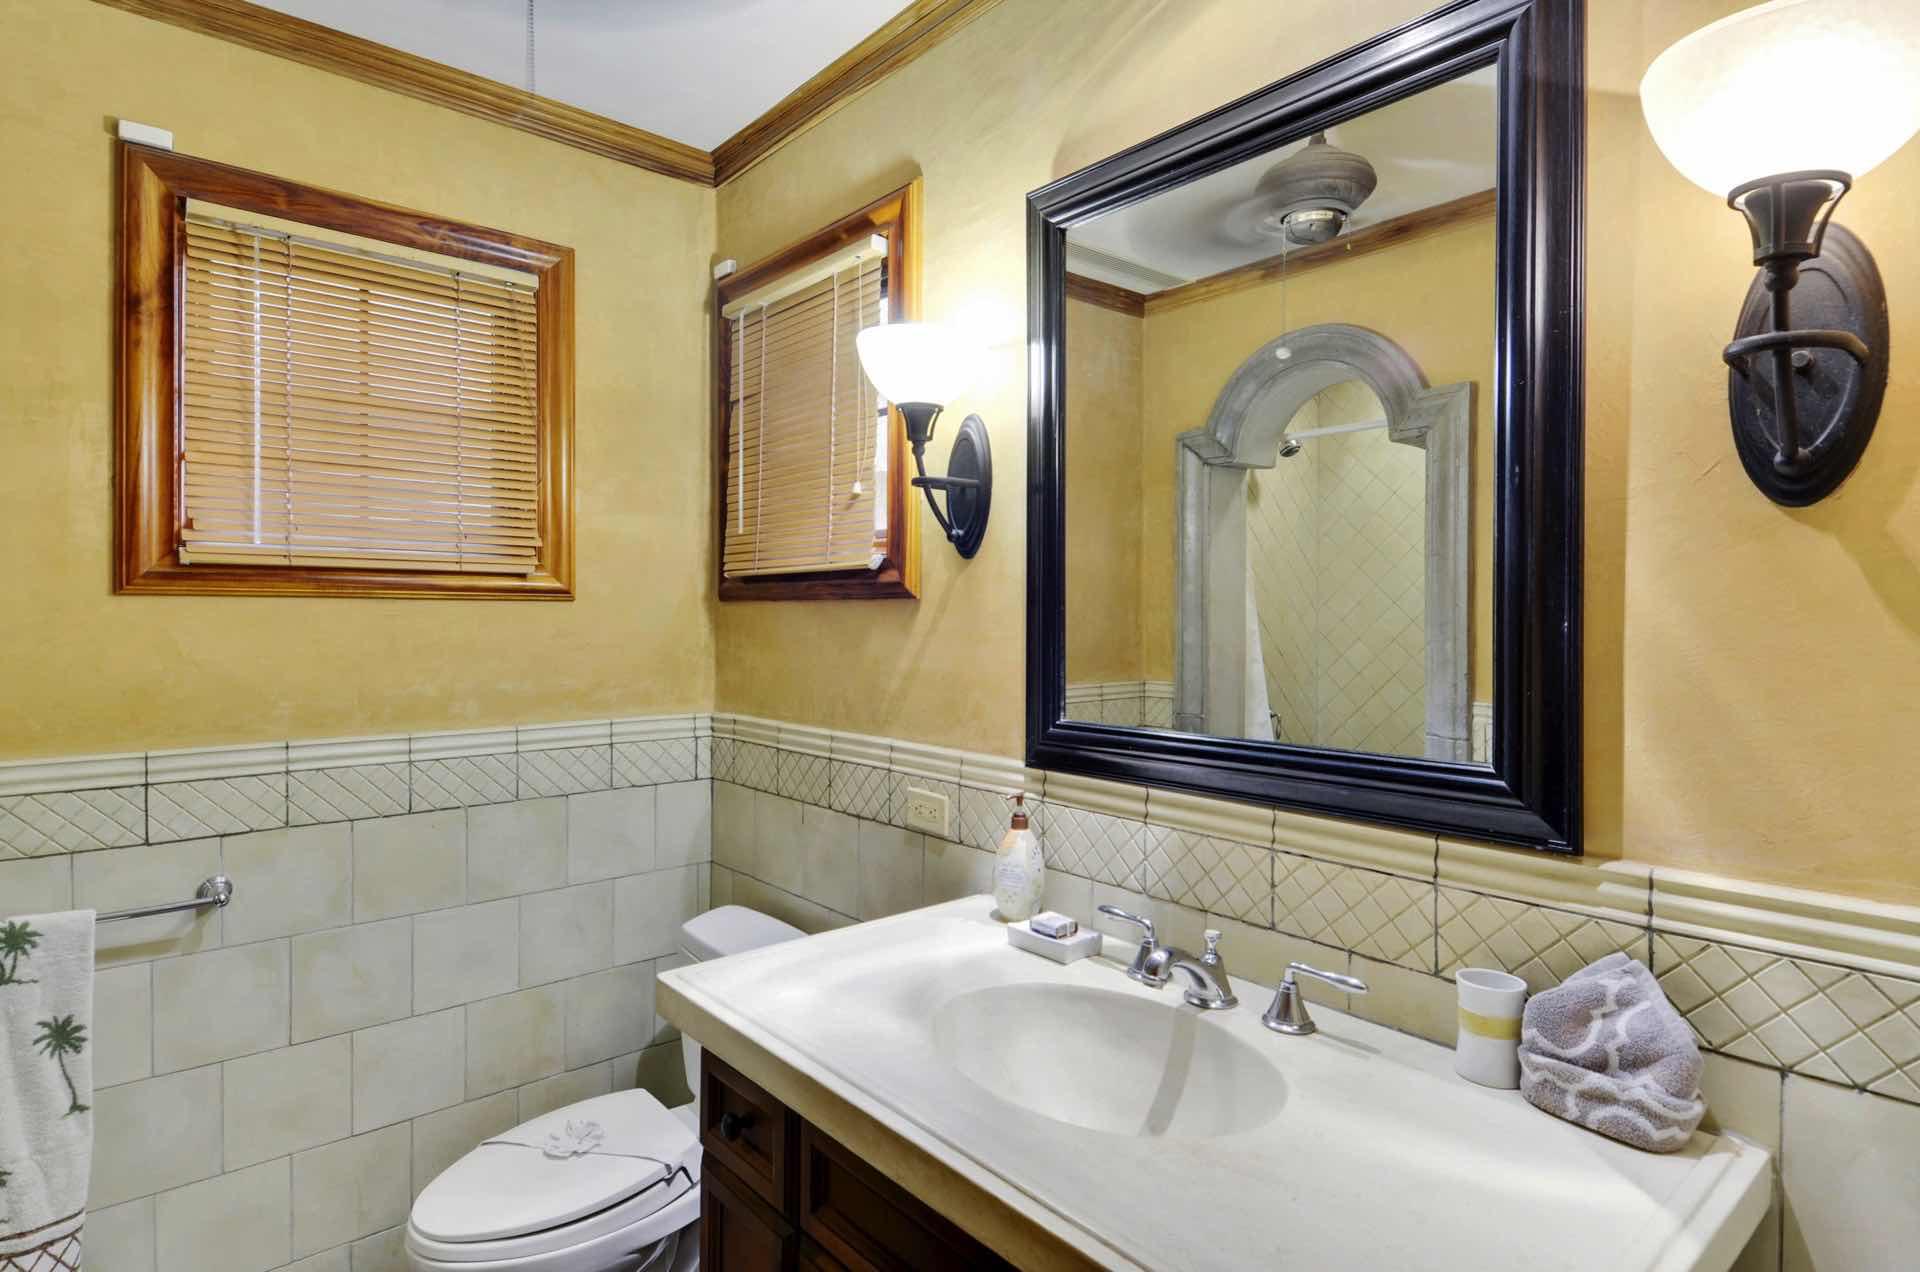 2nd Bedroom Bathroom View